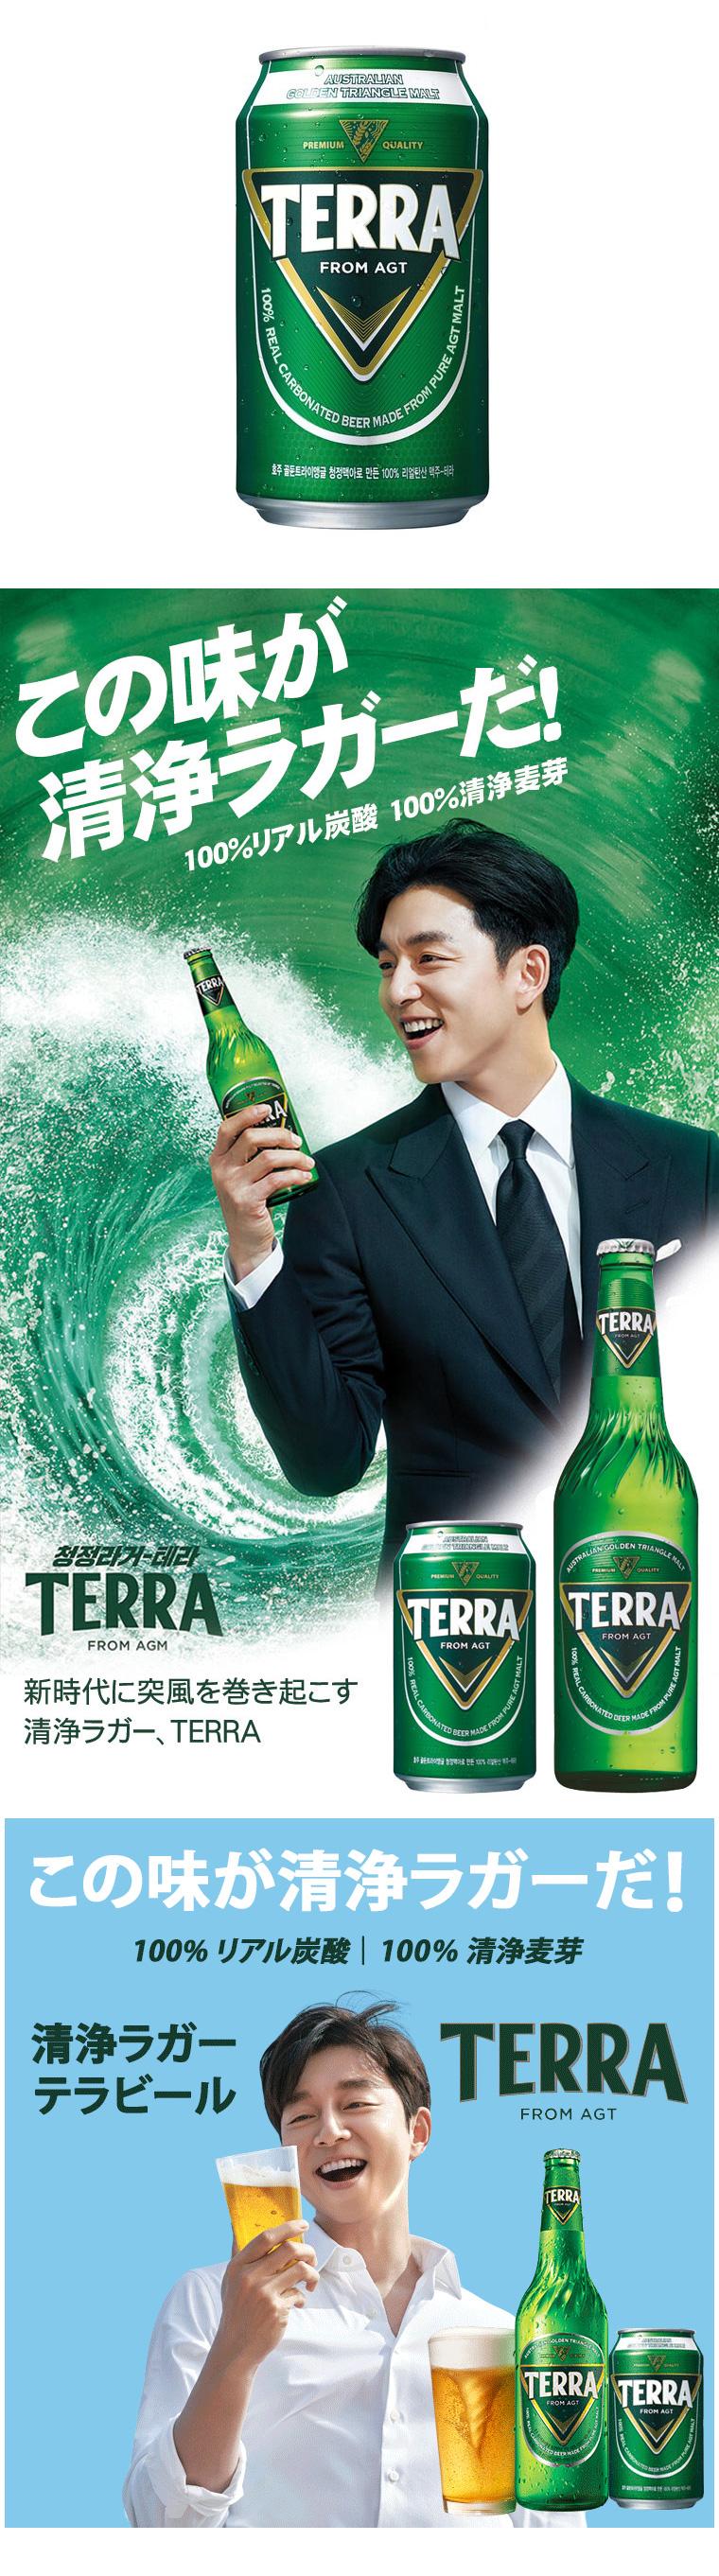 jinro TERRA テラビール / 缶ビール